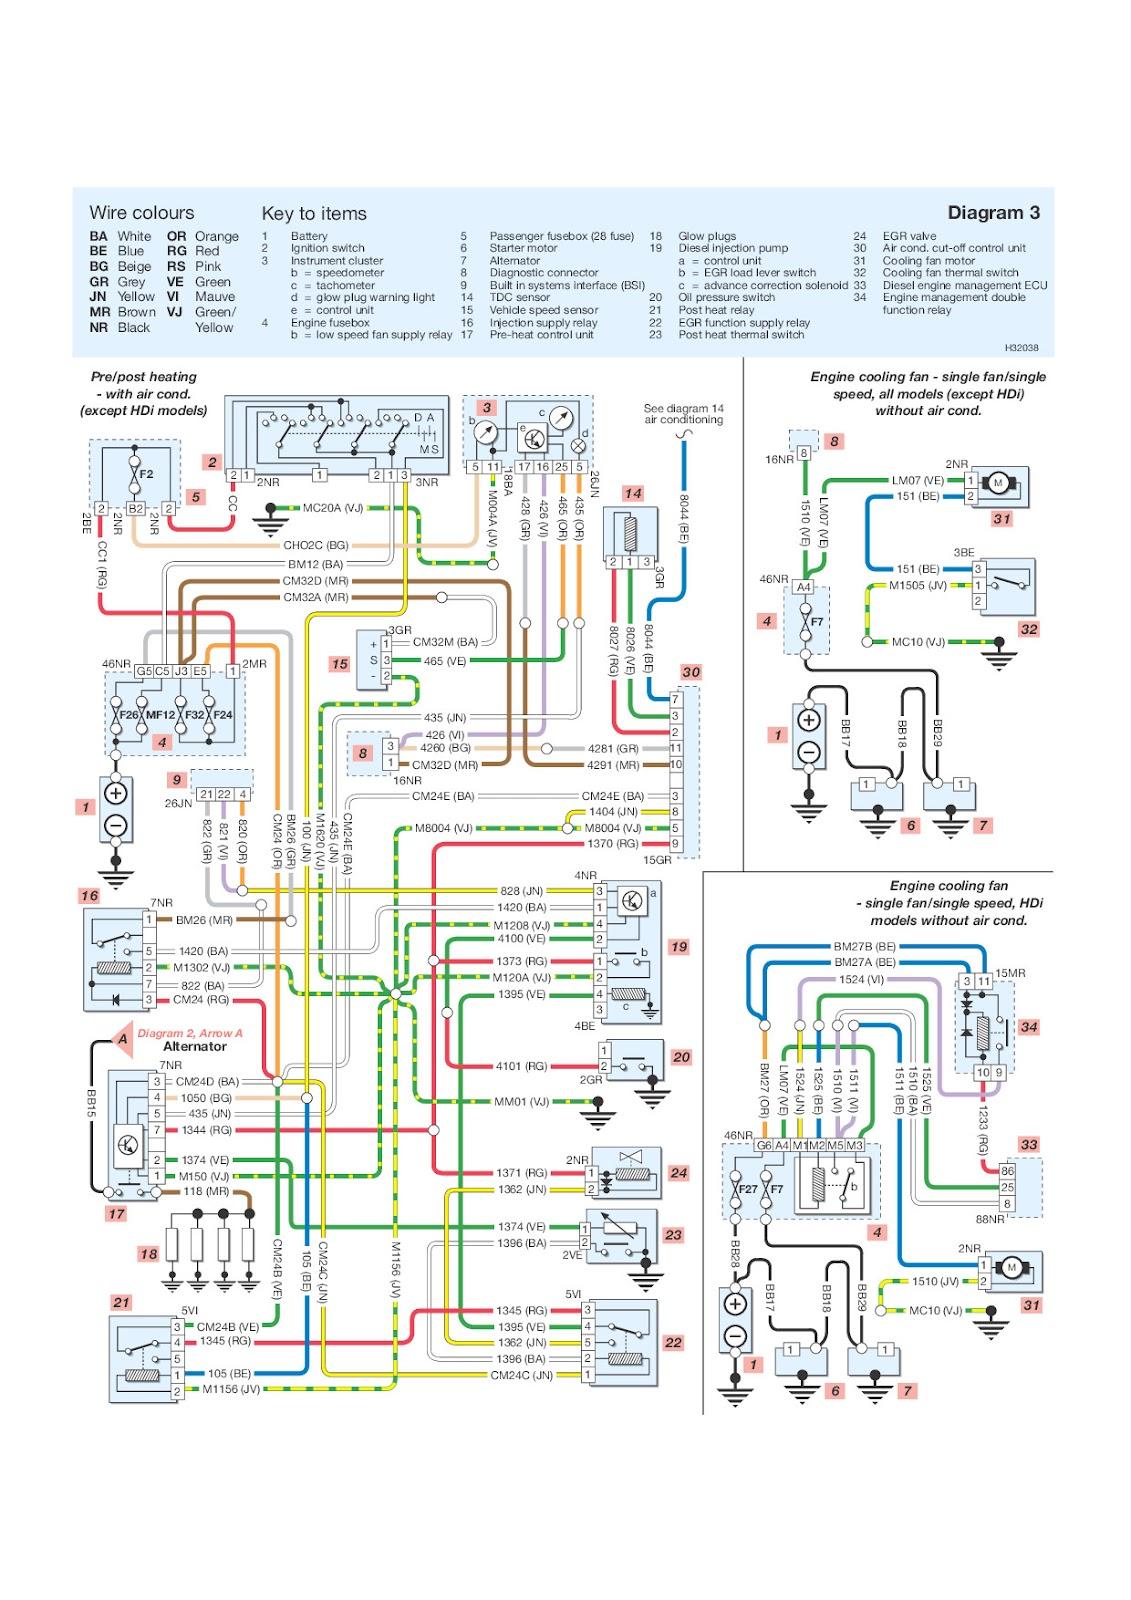 Peugeot 207 Fuse Box Diagram Deutz Engine Wiring Diagram Sn95 Gauge